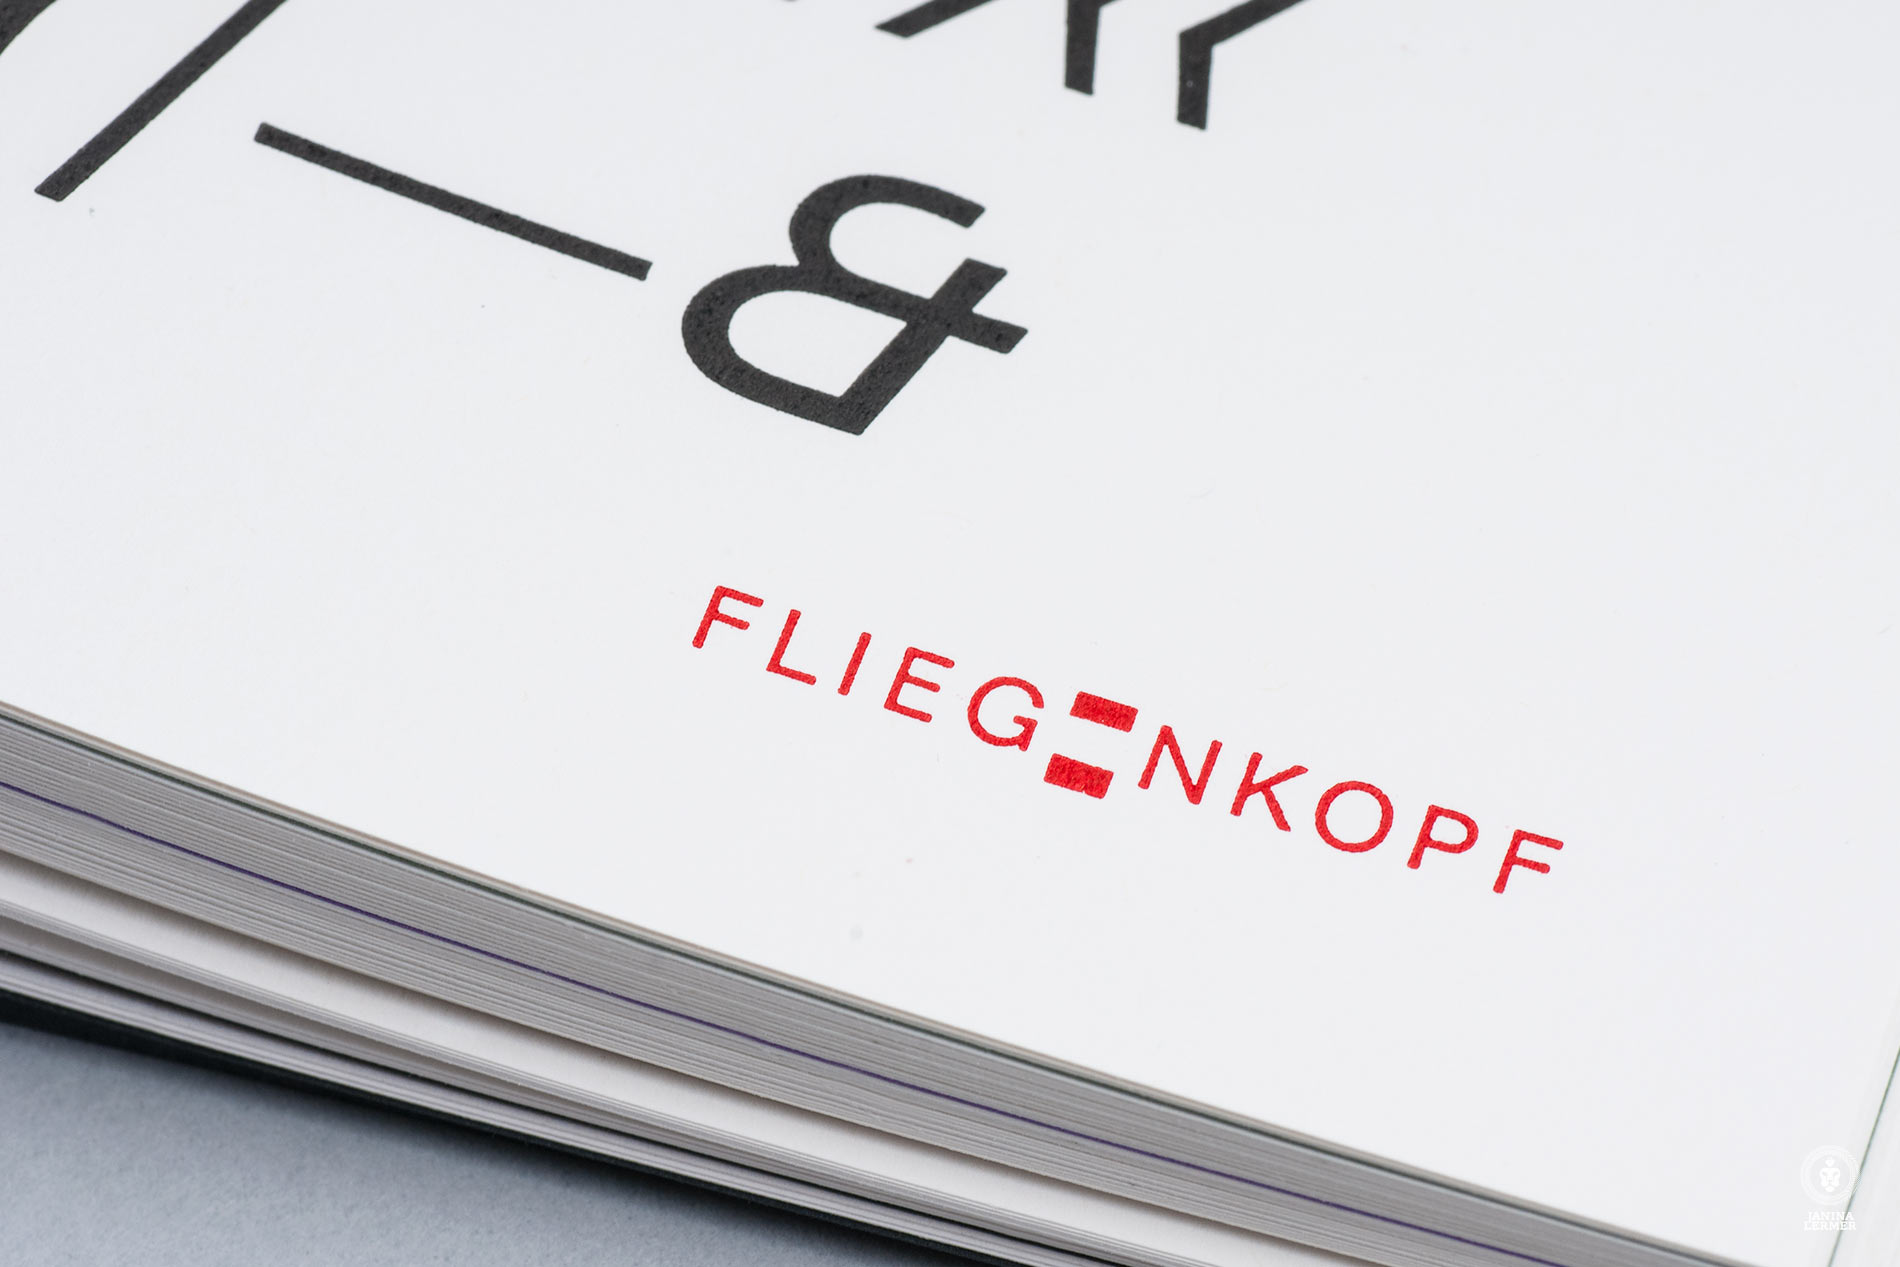 Janina-Lermer-Buchgestaltung-Magazingestaltung-Editorialdesign-Bleisatz-Metalpress-Logo-Handgedruckt-Handprinted-Werkstatt-Fliegenkopf